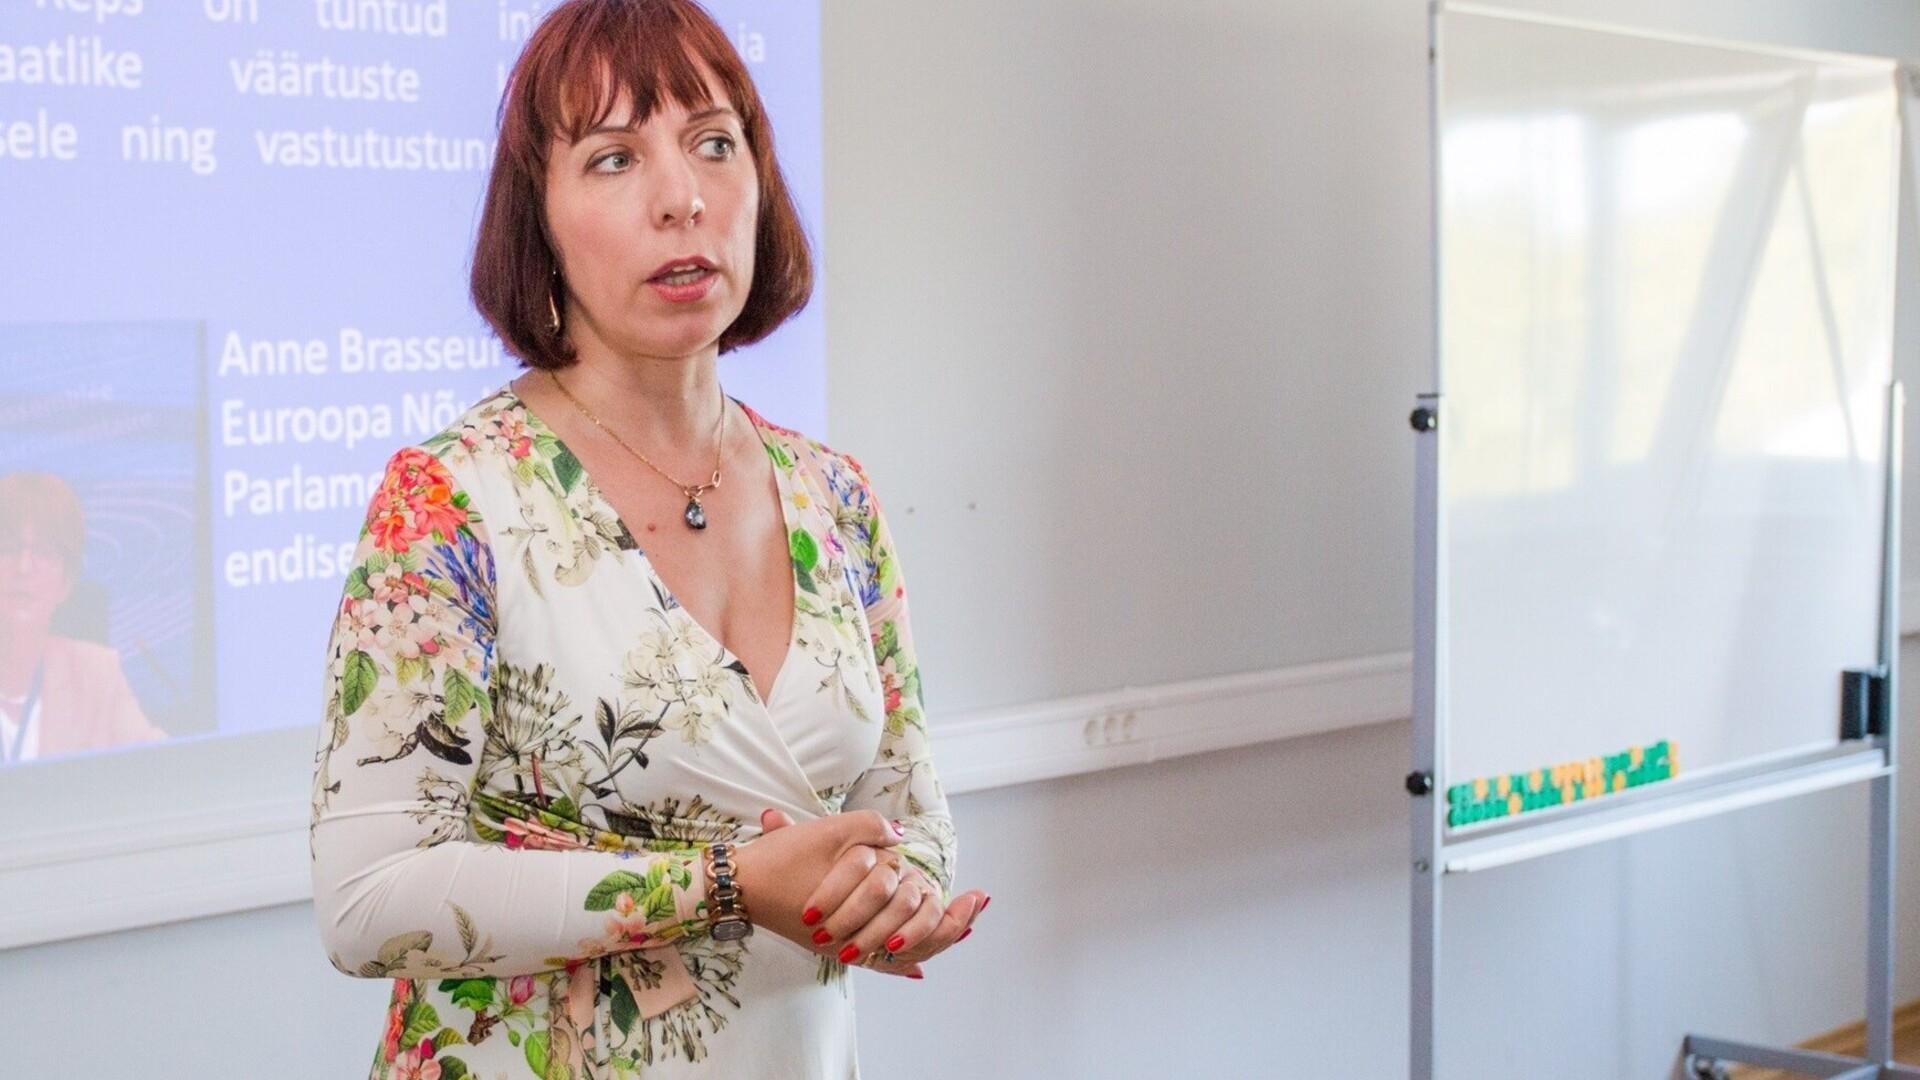 news.err.ee - Err - Minister falls victim to Russian propaganda